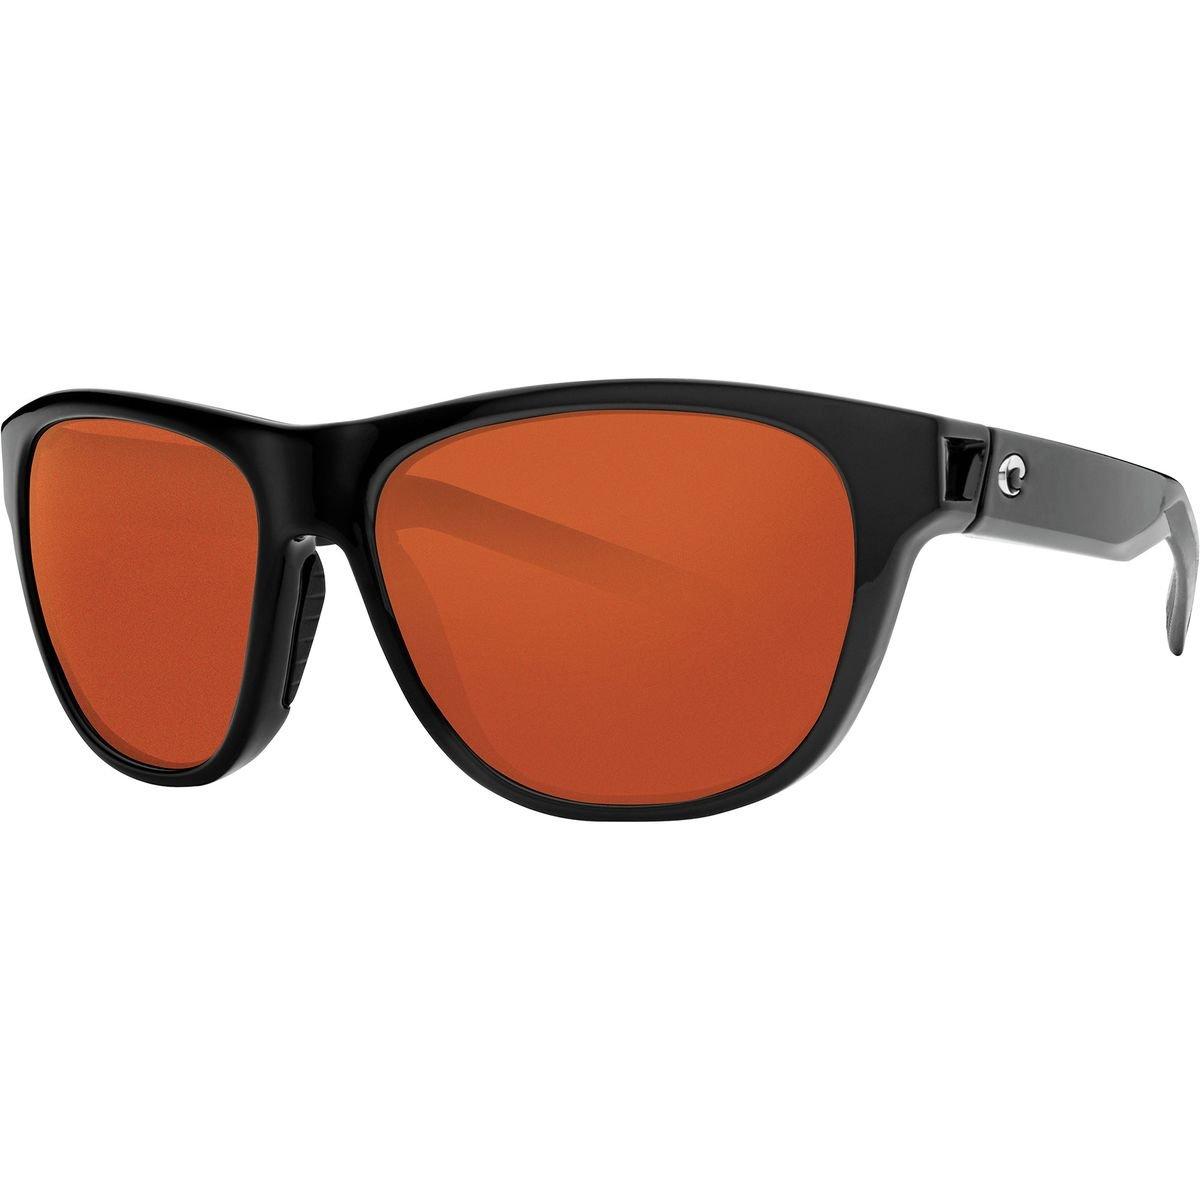 Costa Bayside偏光580pサングラス B07BGCV5DG One Size|Copper 580p/Shiny Black Frame Copper 580p/Shiny Black Frame One Size